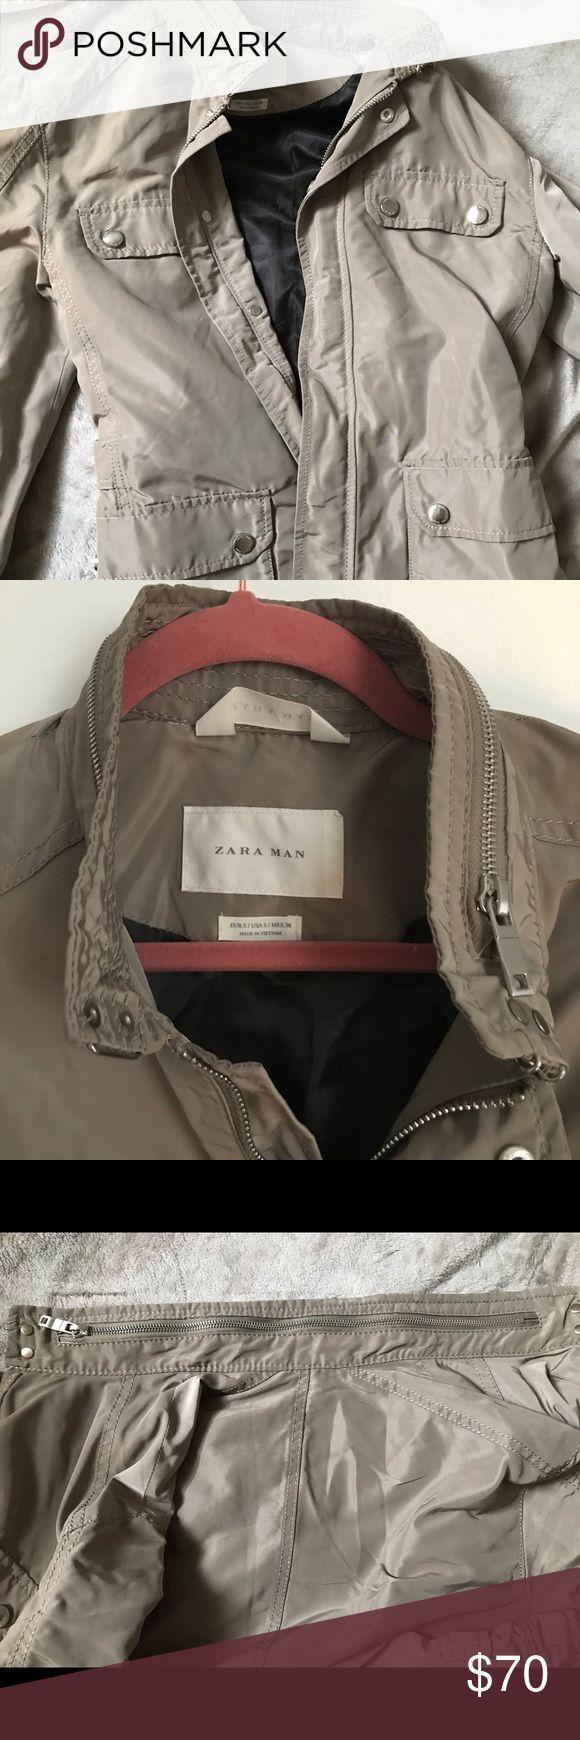 WEEKEND SALE🔥ZARA MAN 🎉HOST PICK💥⚡️🔥‼️ Perfect condition Zara Man jacket. Sleek look. Perfect for fall. Zara Jackets & Coats